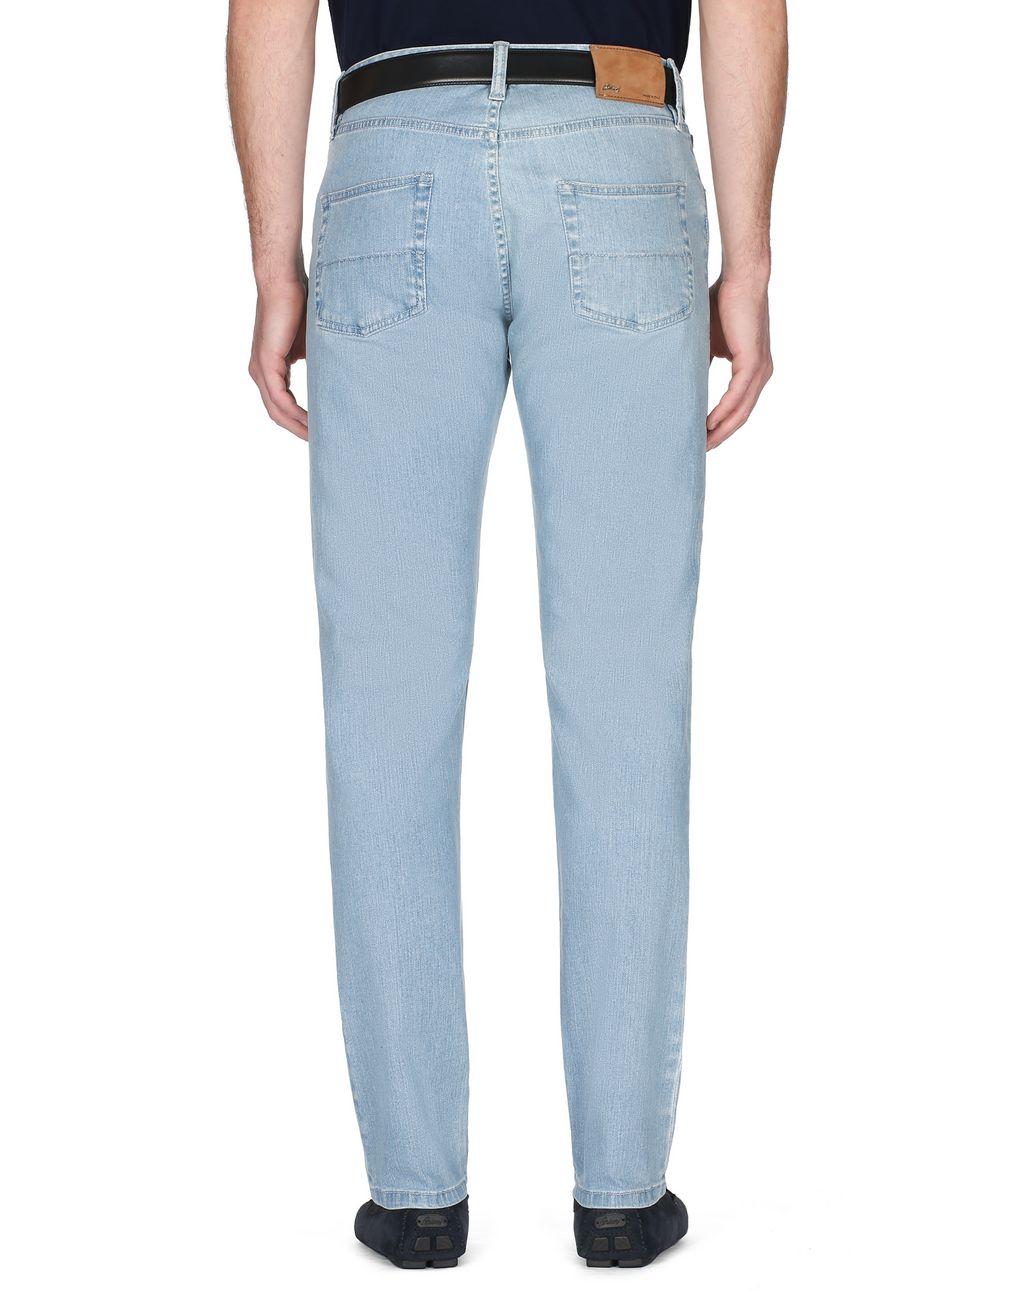 BRIONI Light Blue Denim Trousers Trousers Man d